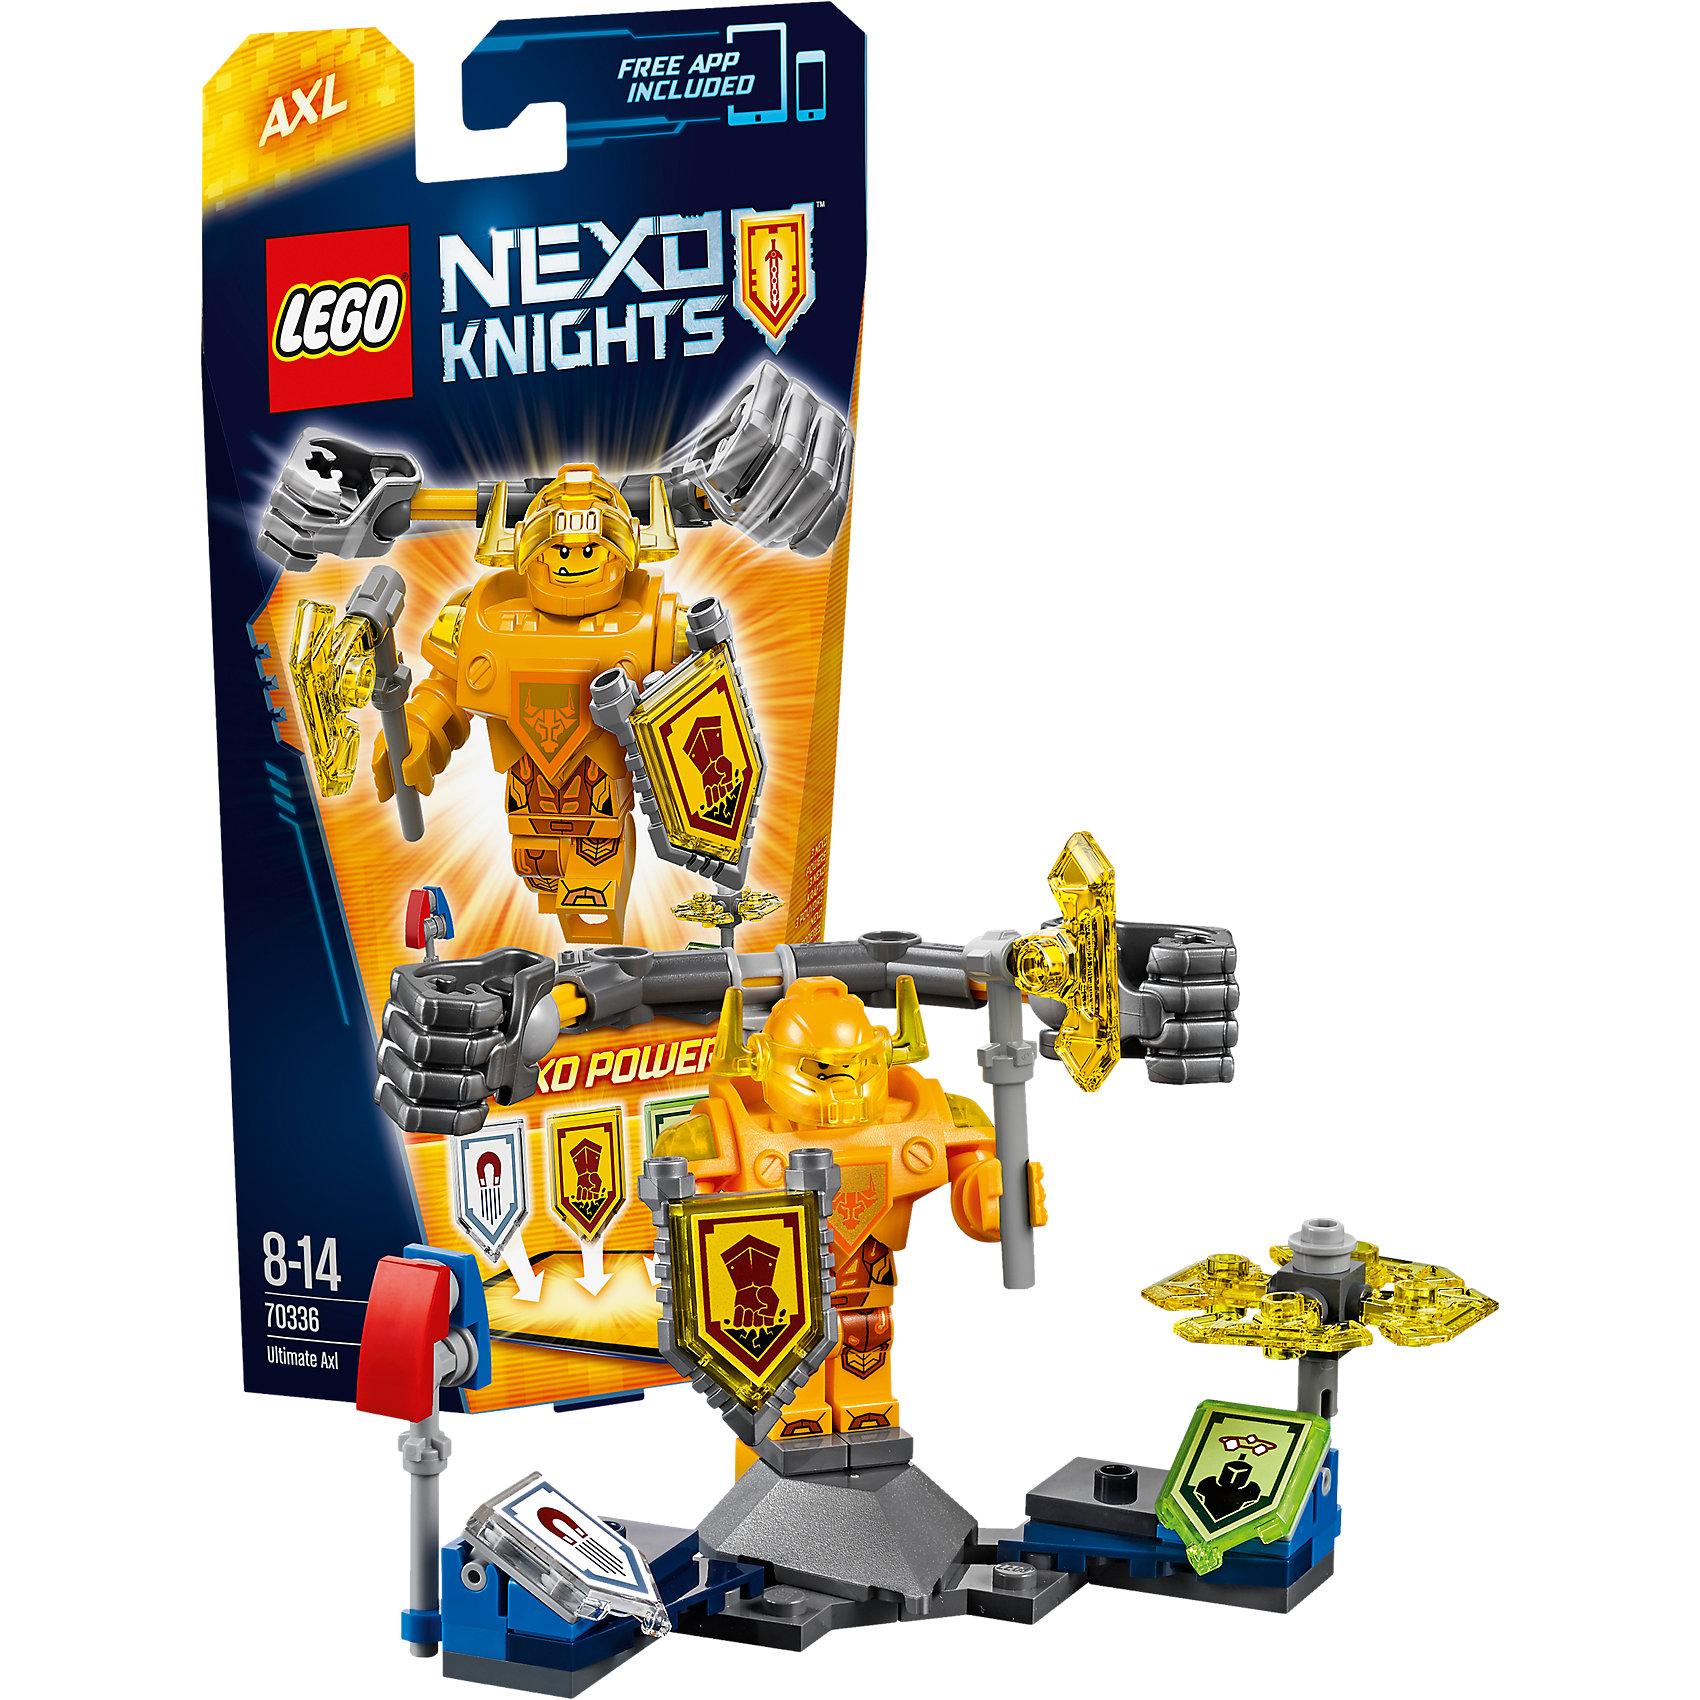 LEGO LEGO NEXO KNIGHTS 70336: Аксель- Абсолютная сила lego lego nexo knights 70334 предводитель монстров – абсолютная сила